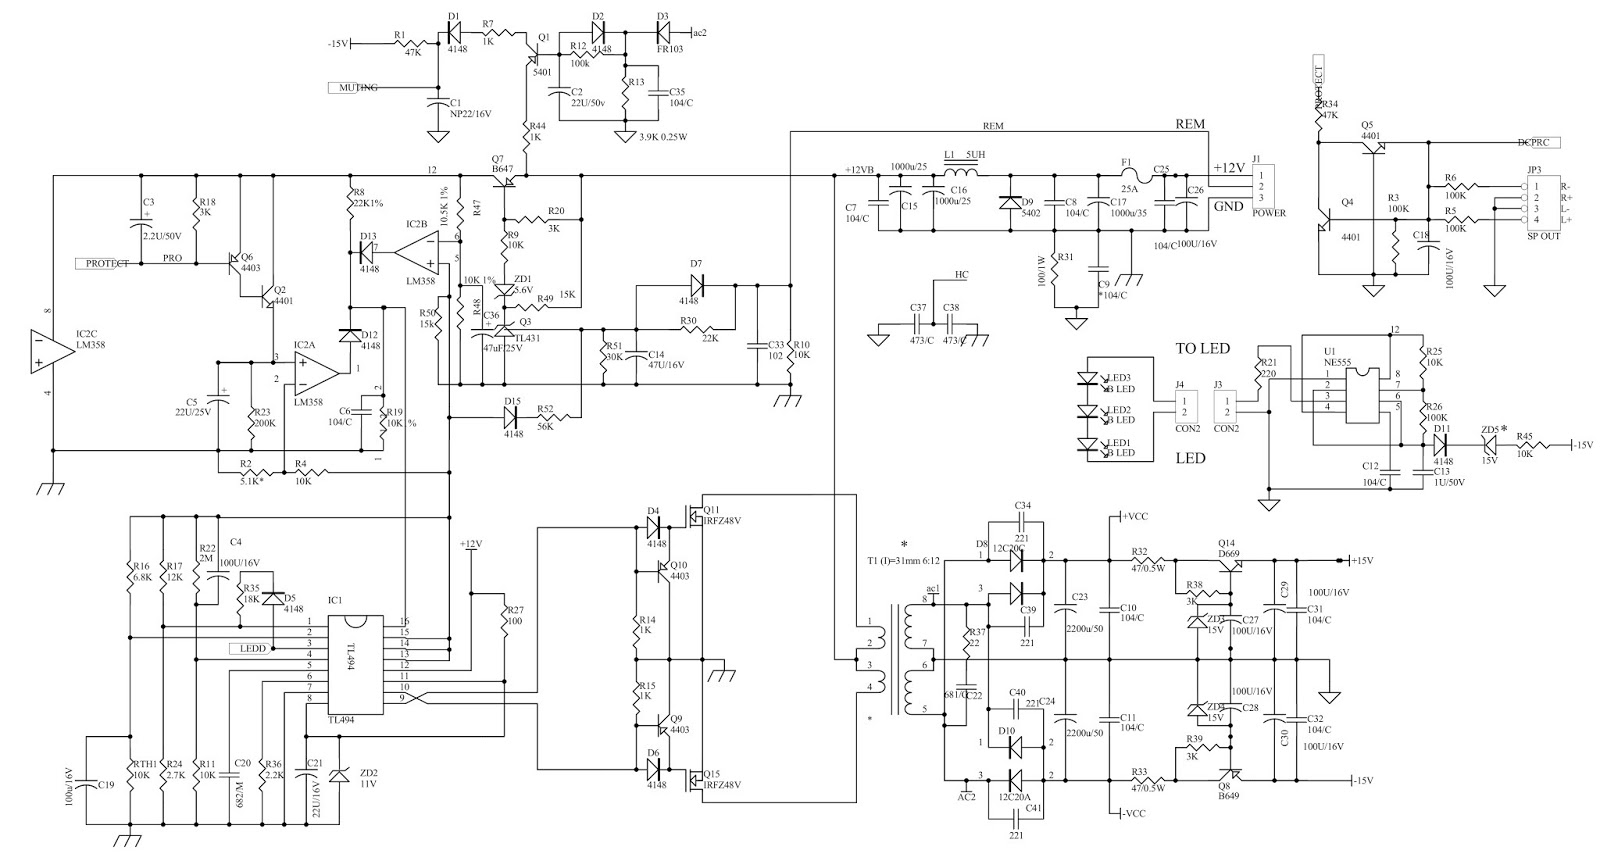 medium resolution of harley davidson speaker wiring diagrams free download wiring diagram